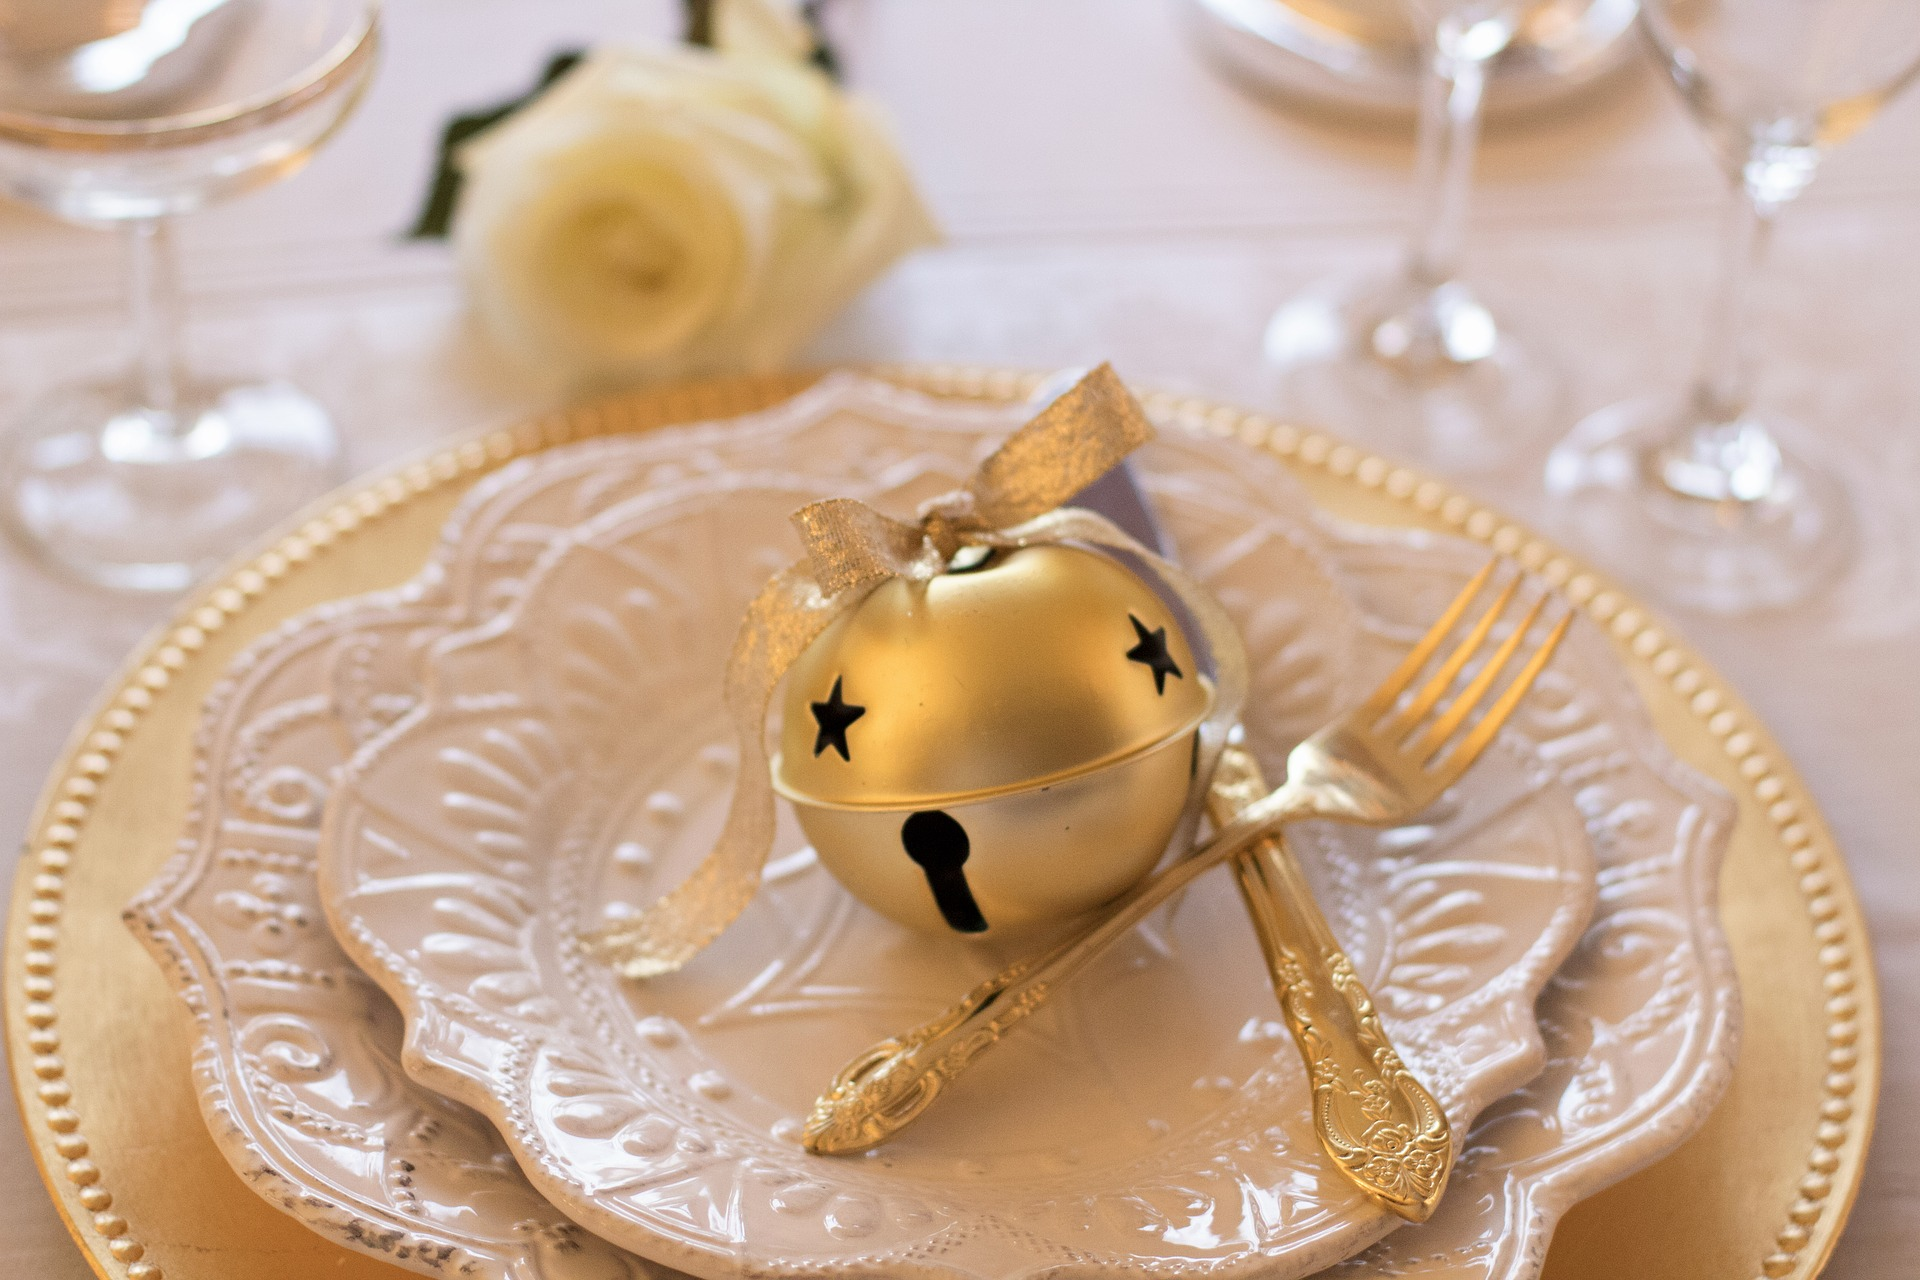 la perfetta tavola delle feste